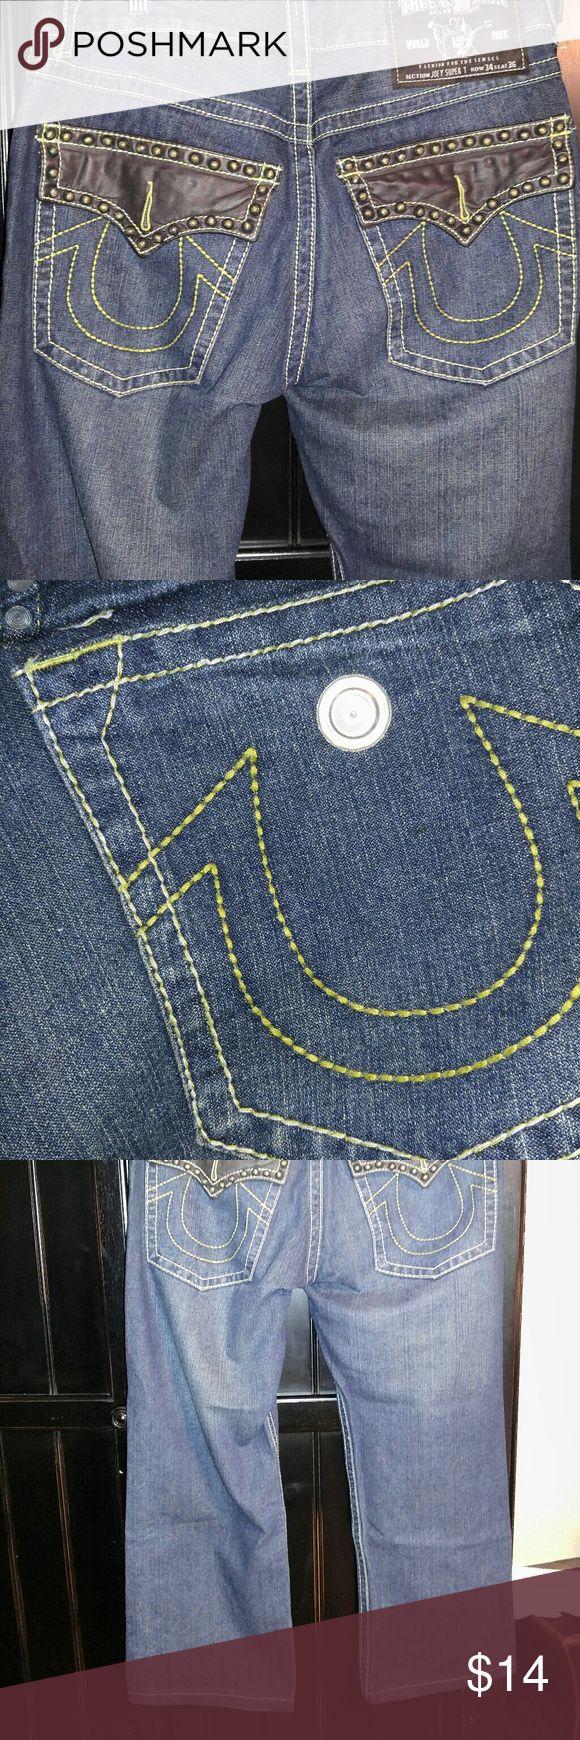 True Religion Mens Jeans Outlet